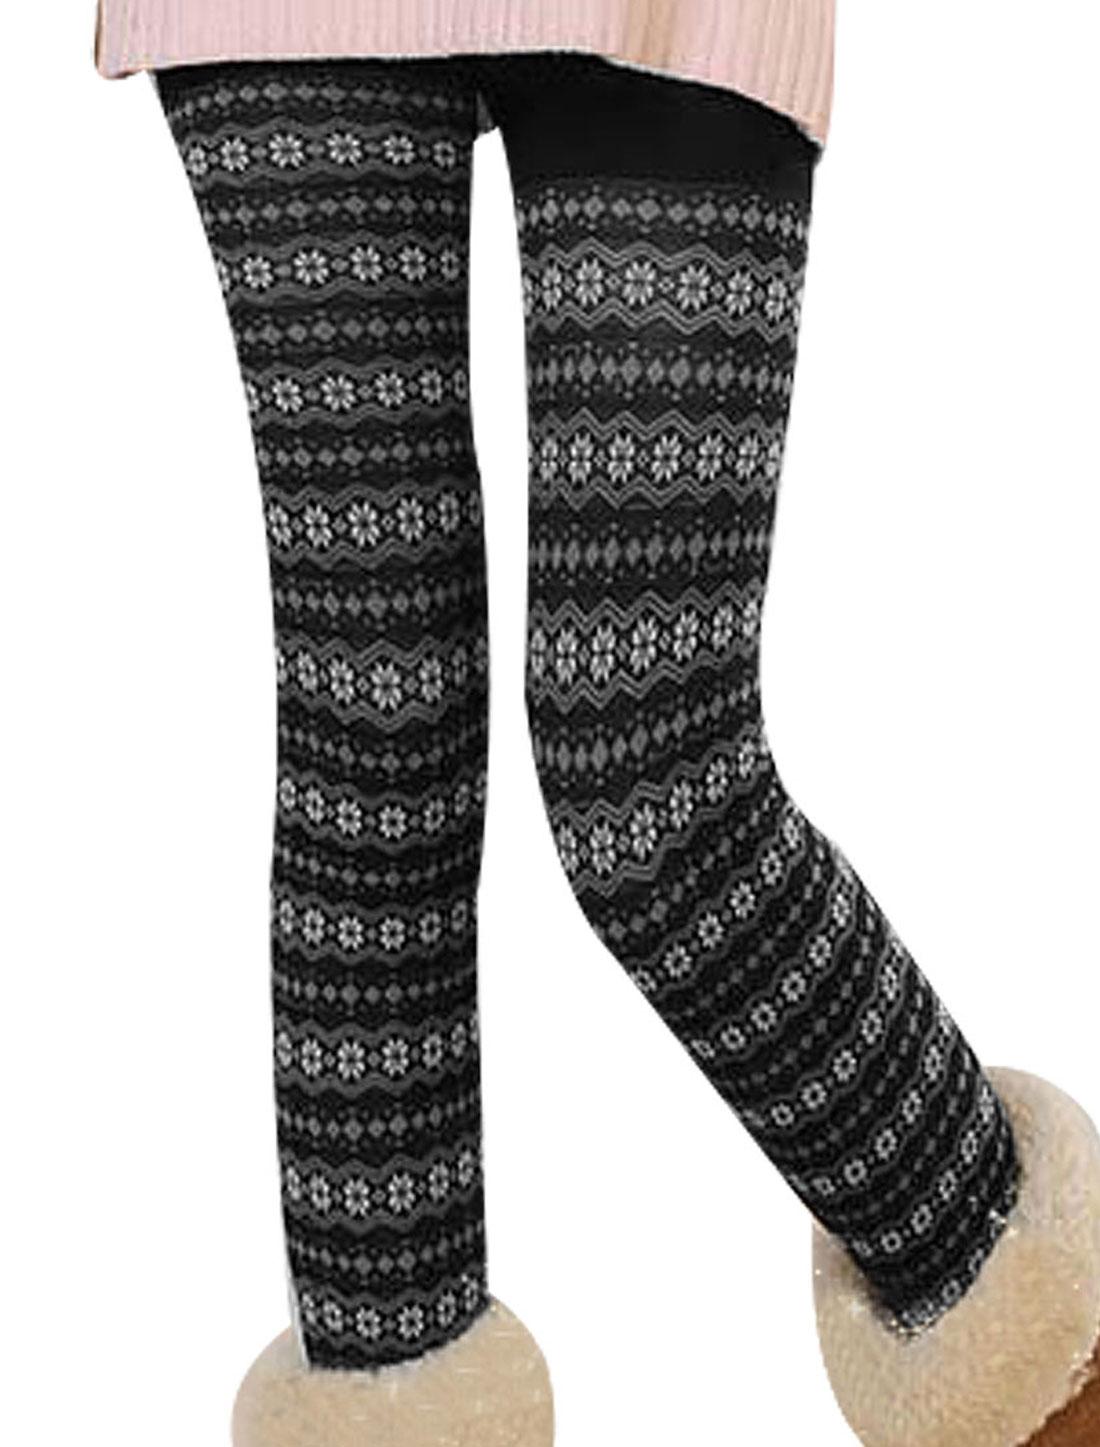 Snowflake Print Black Skinny Legging Pants XS for Women